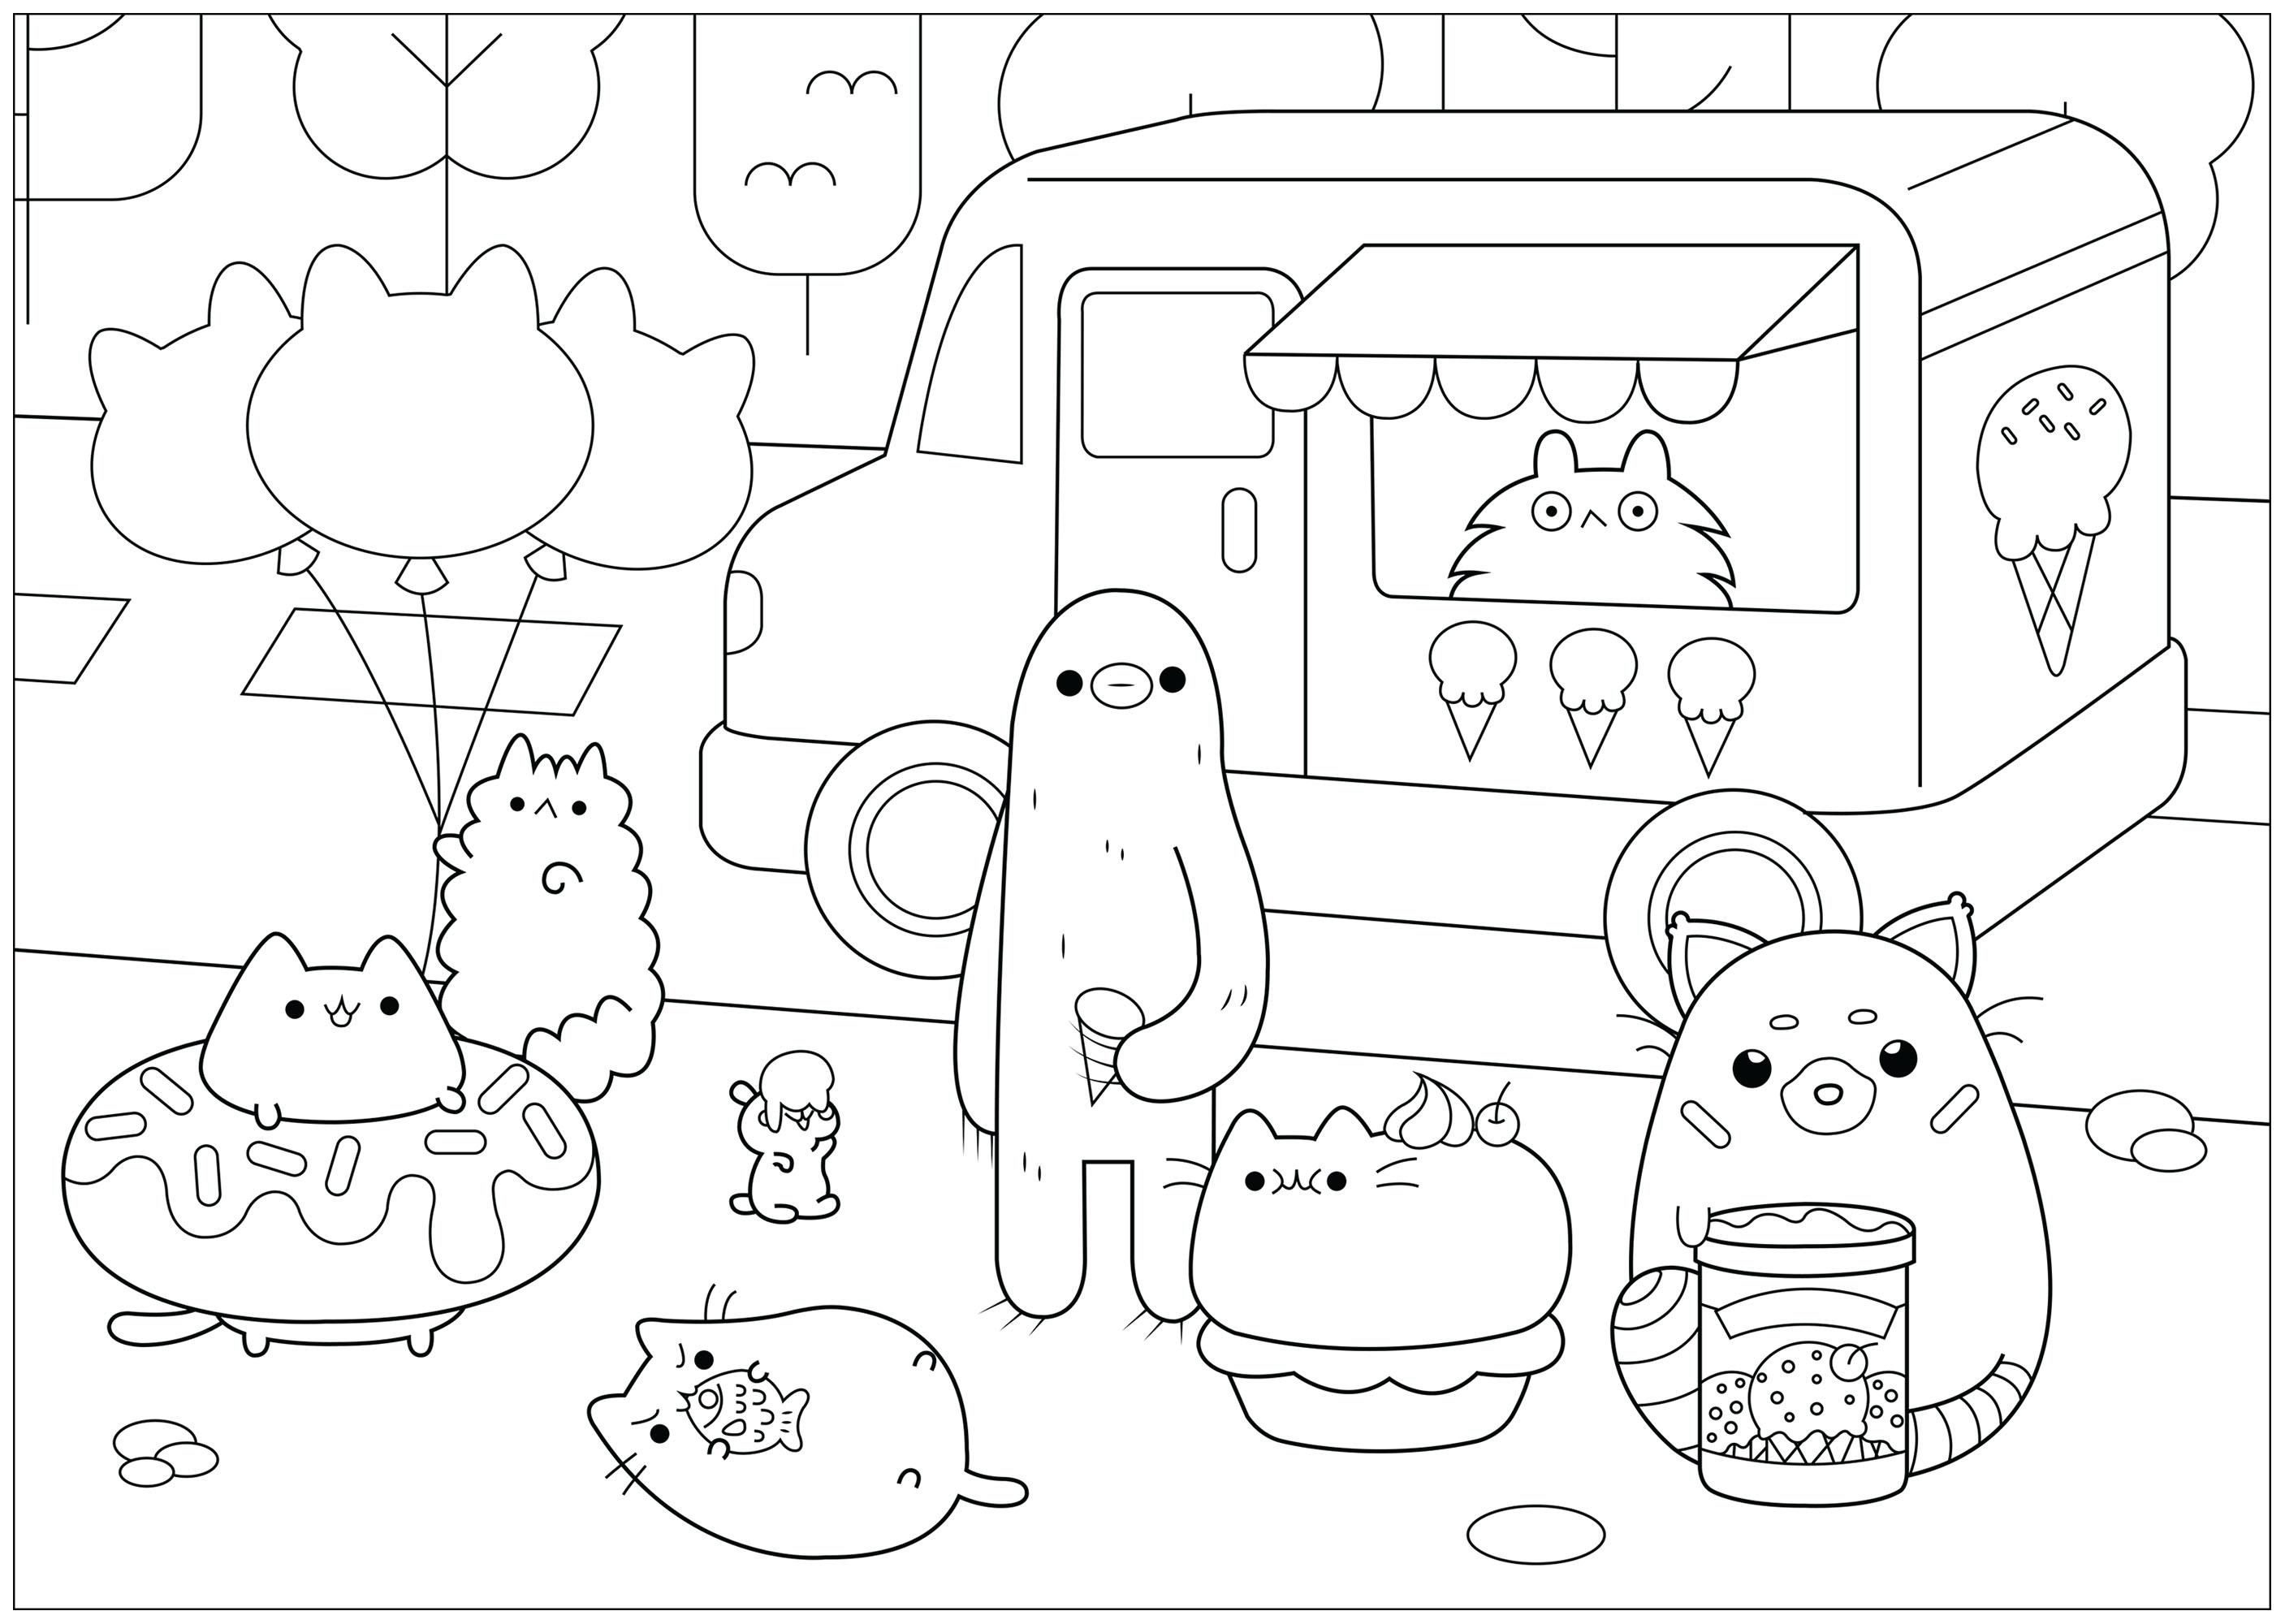 Dibujos De Pusheen Para Colorear Dibujos Para Colorear